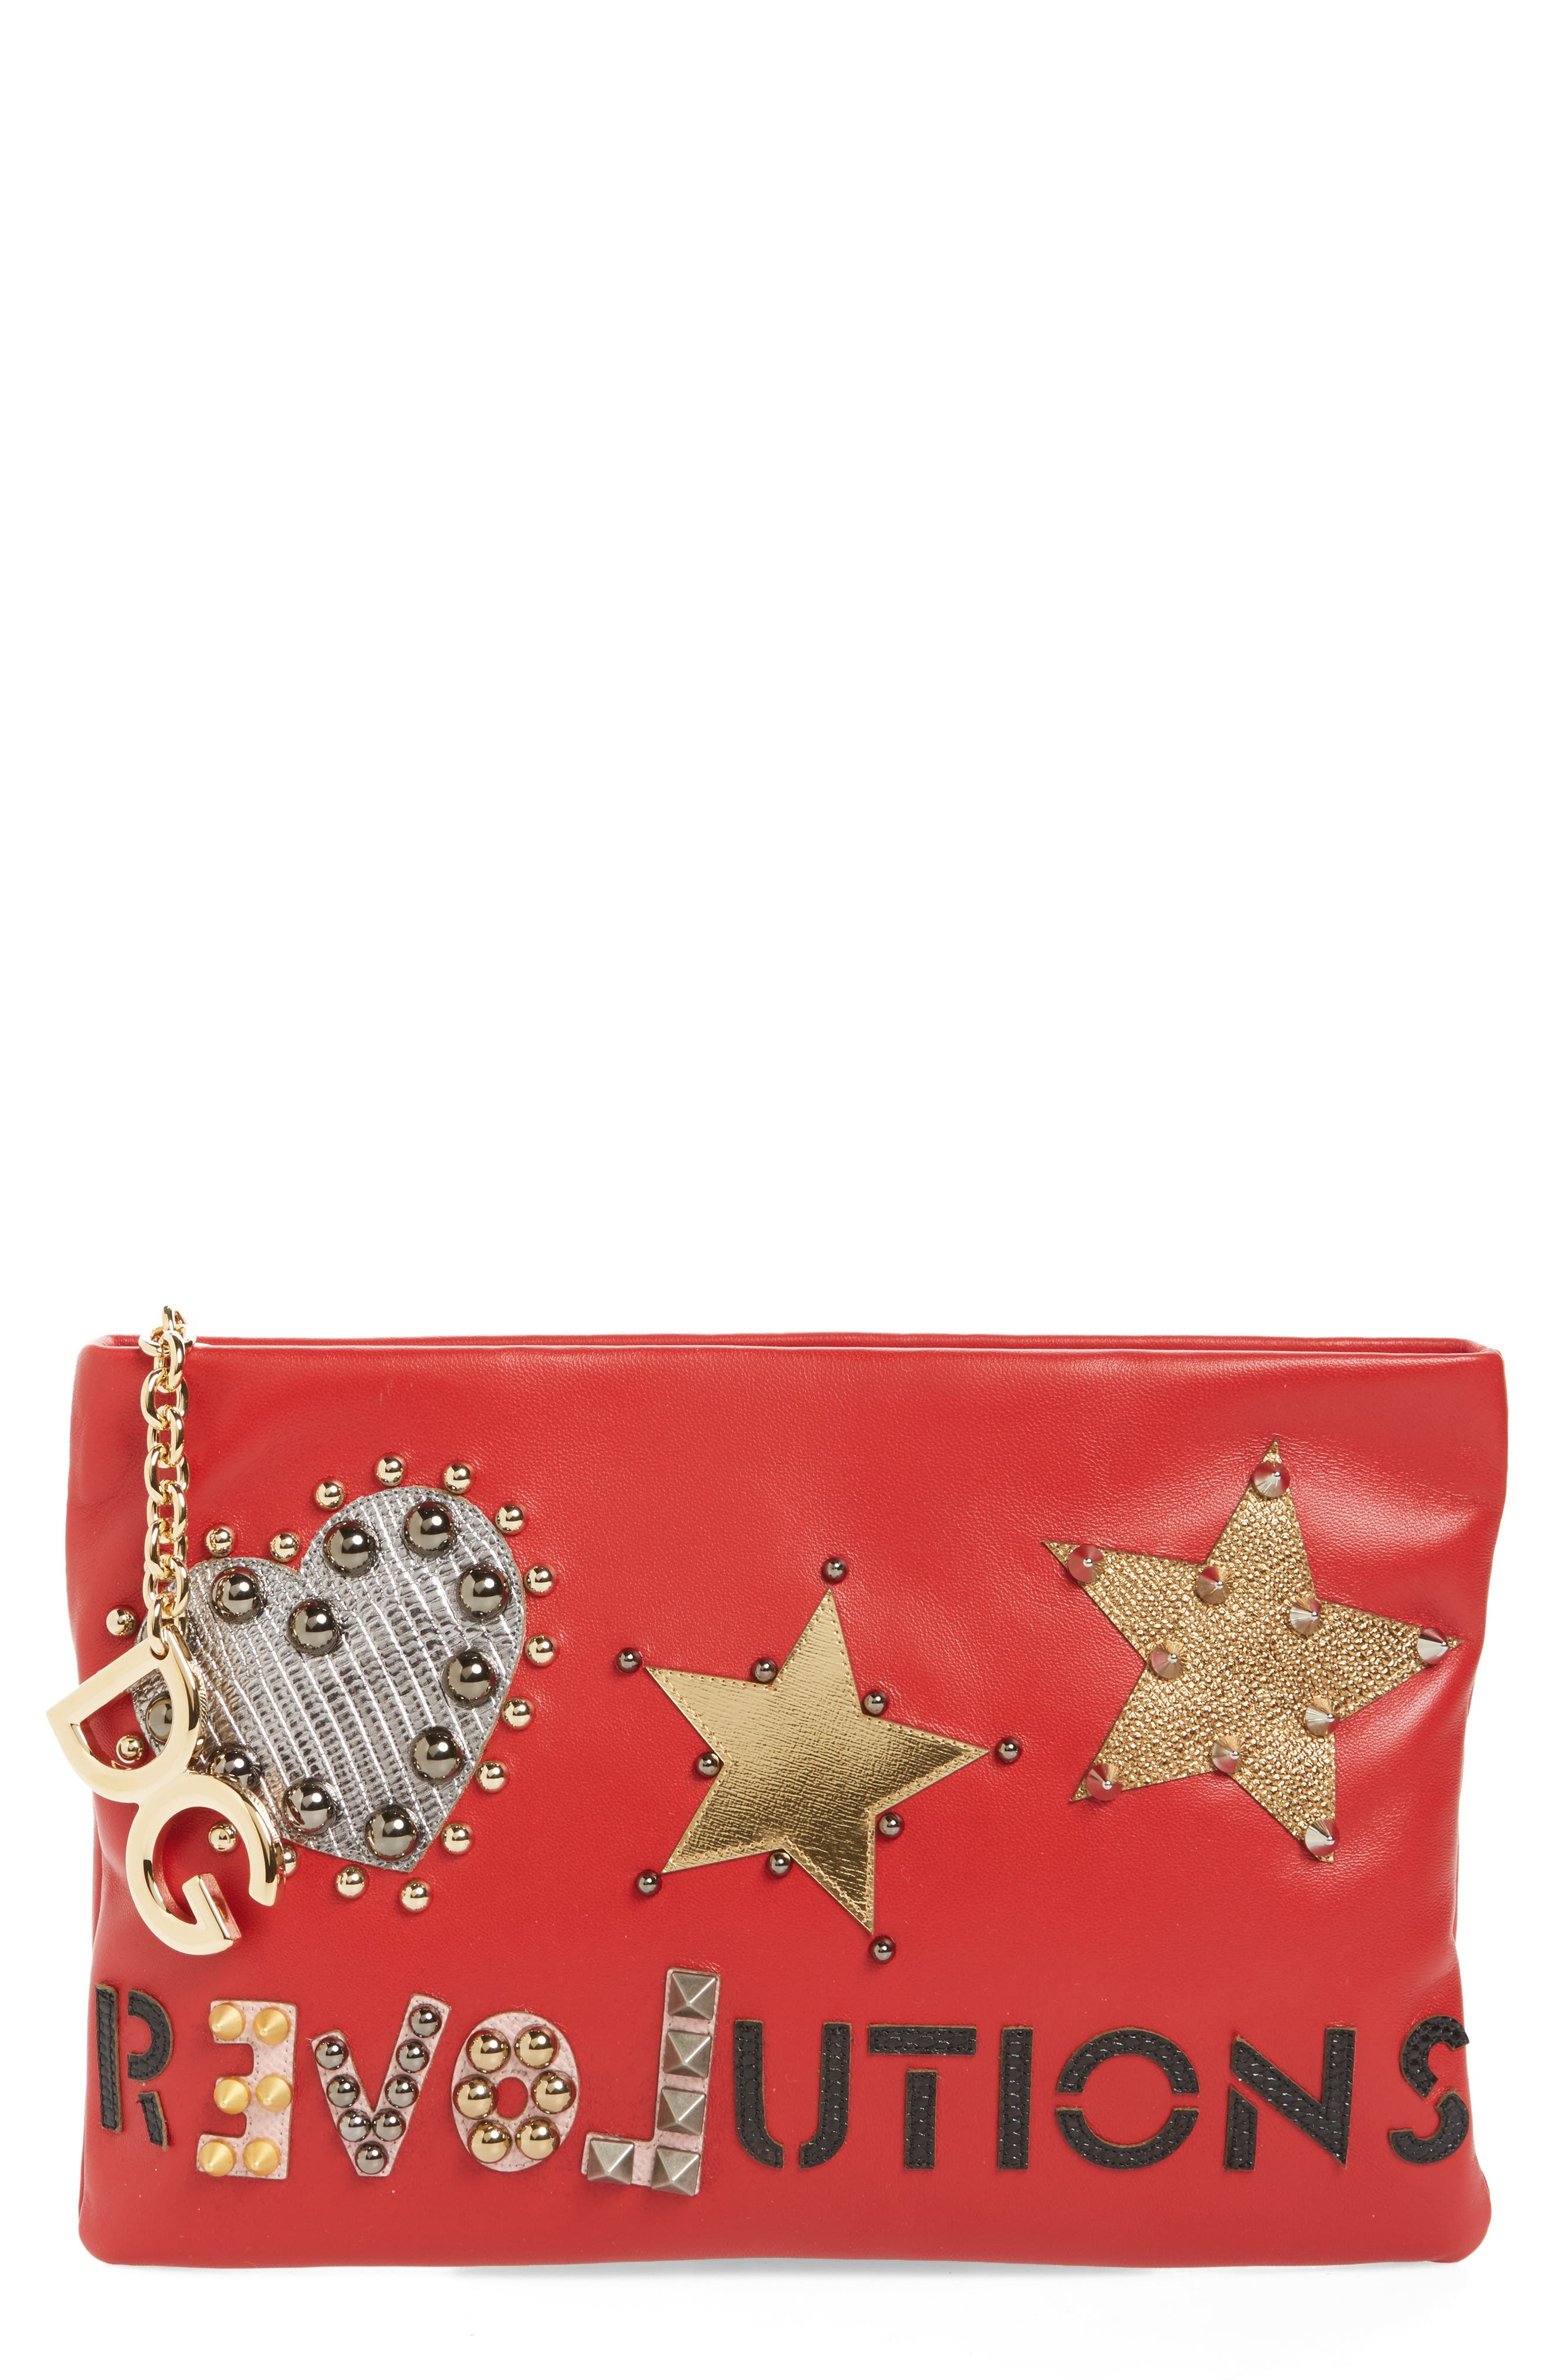 Dolce&Gabbana Medium Cleo Revolution Clutch